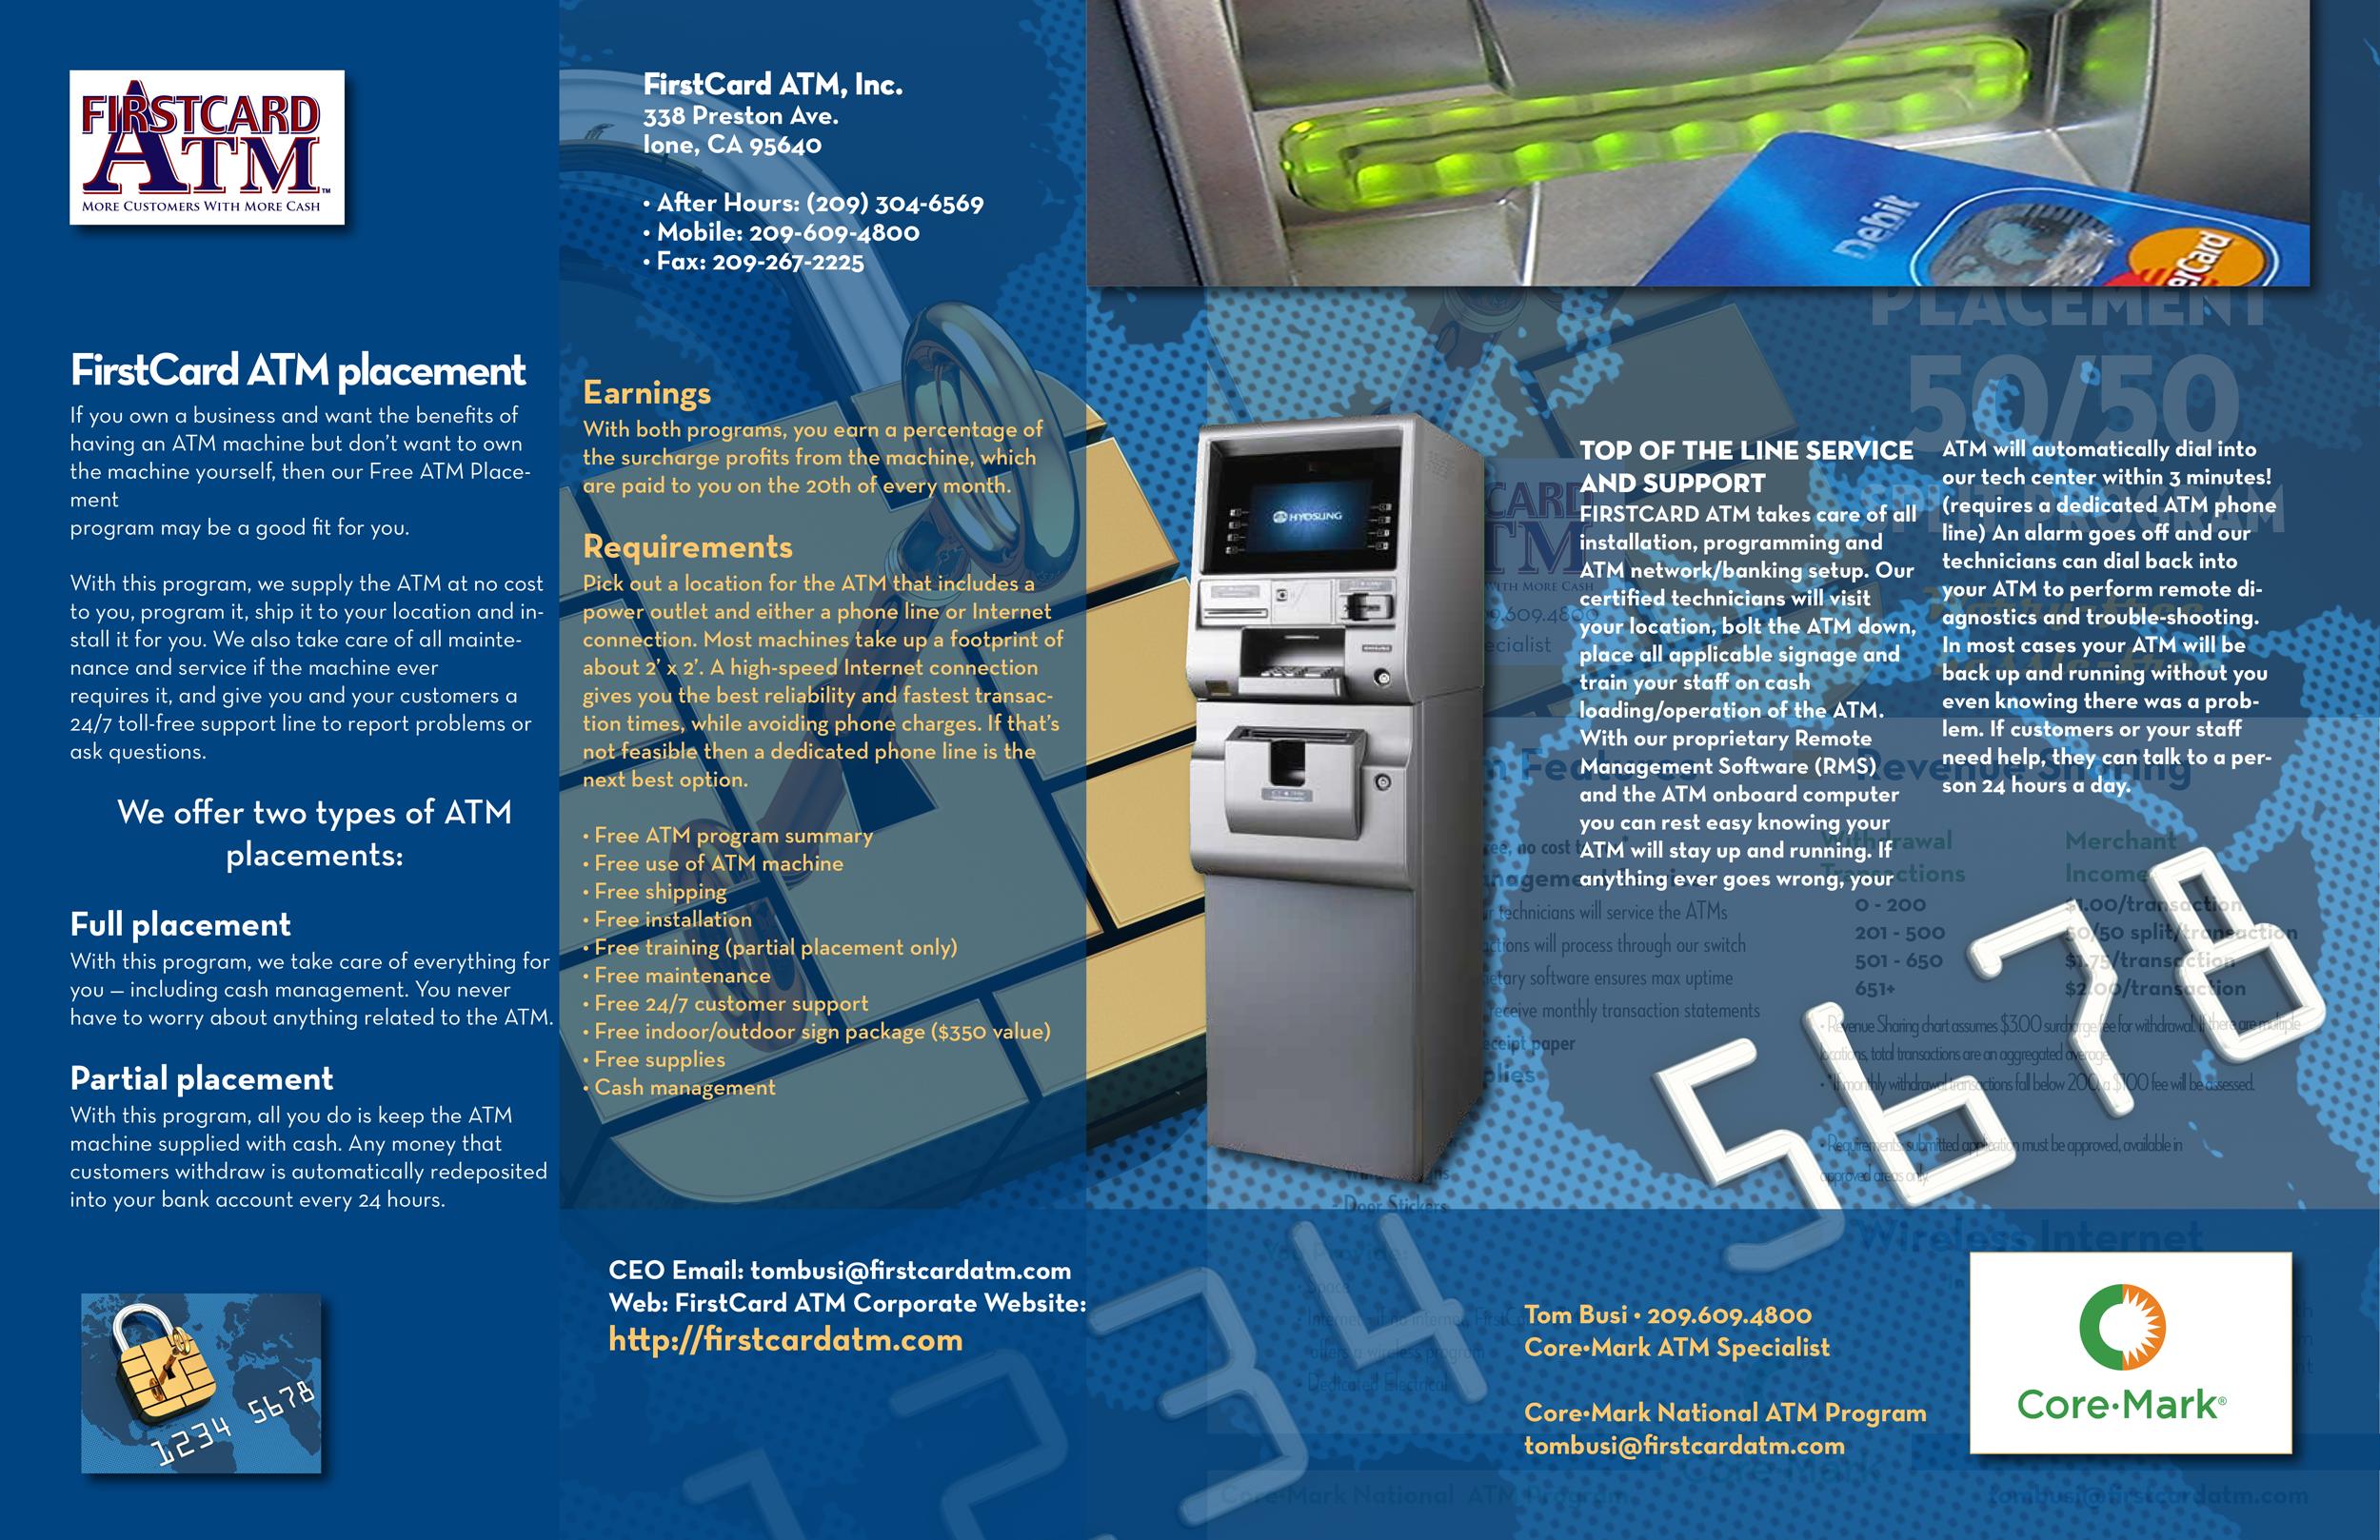 first card atm brochure 11x17 worldhenge creative